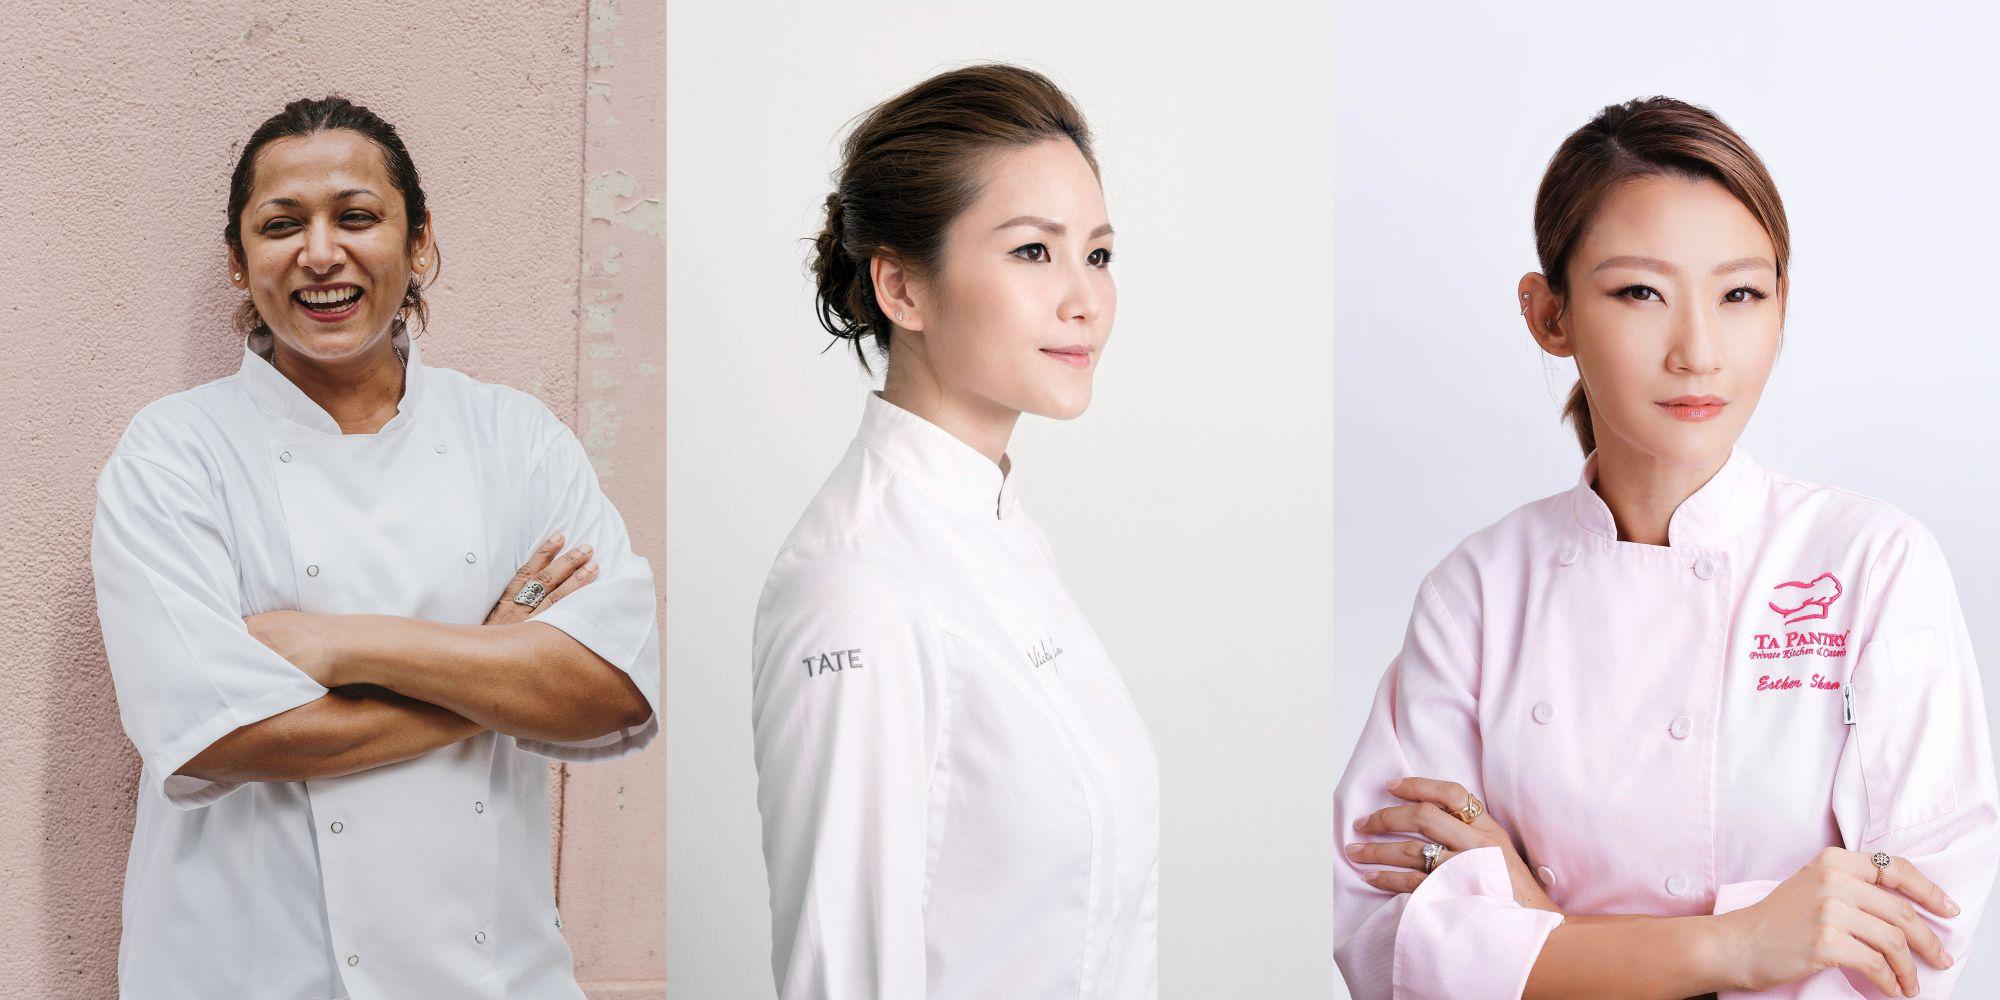 Hong Kong's Female Chefs Share Their Wisdom